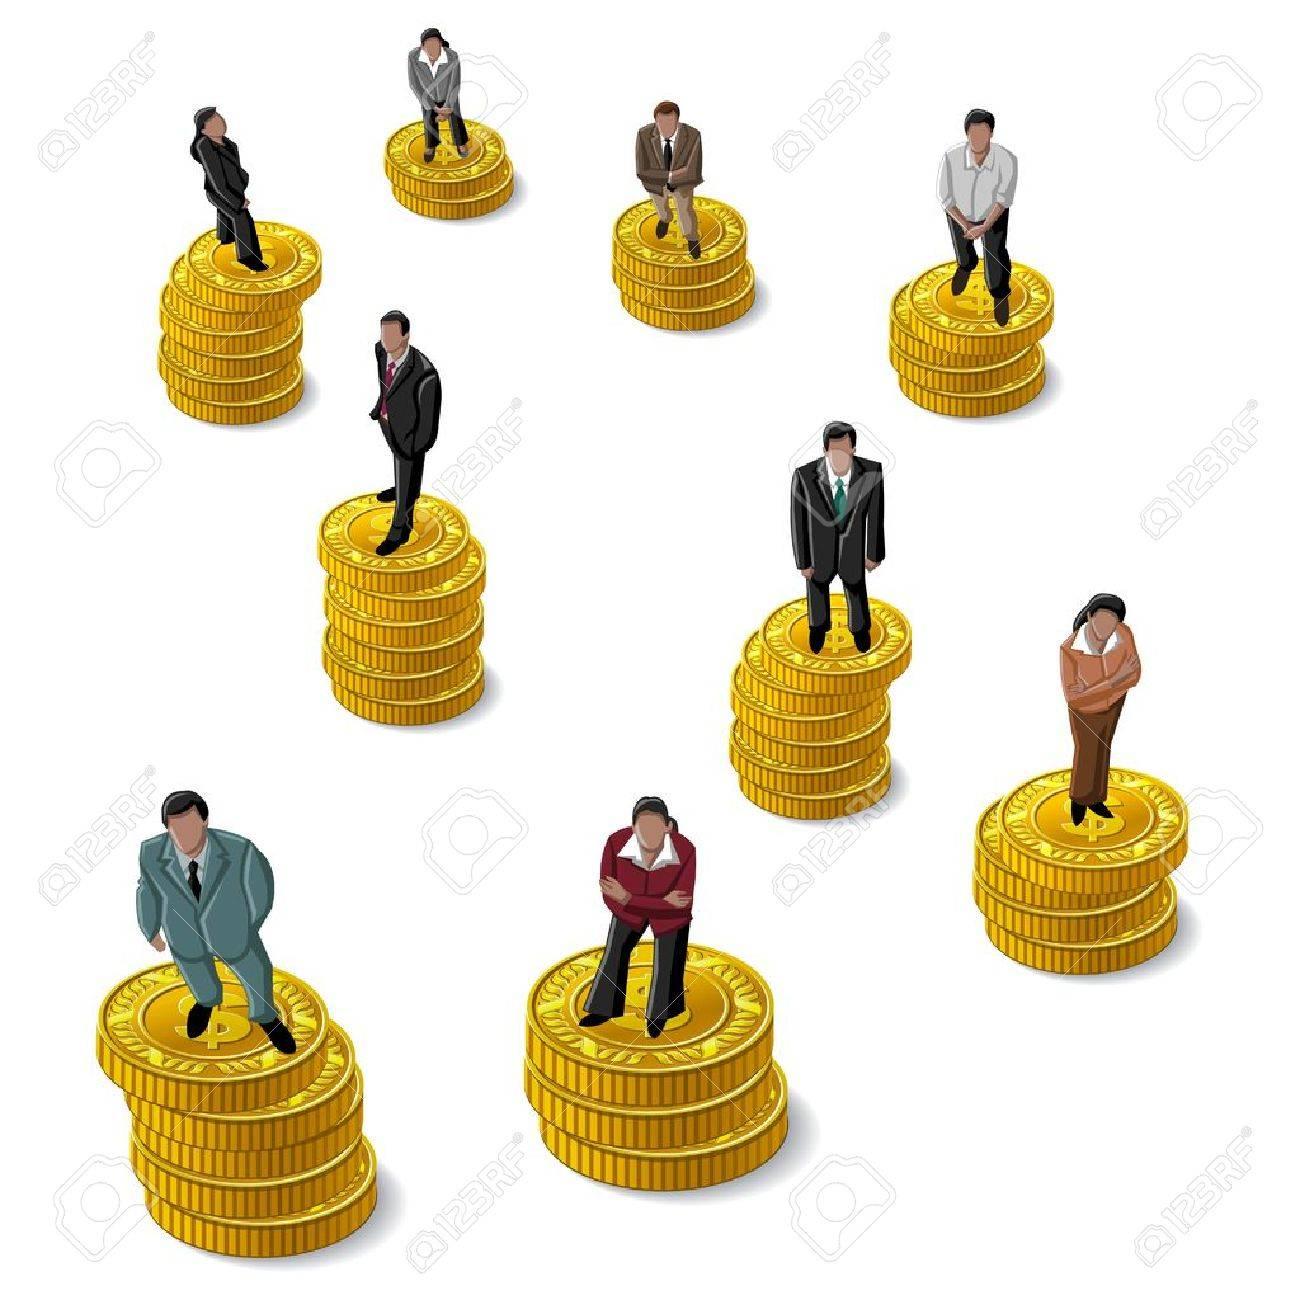 Businessman, Businesswoman standing on coin US Dollar Stock Vector - 16877690